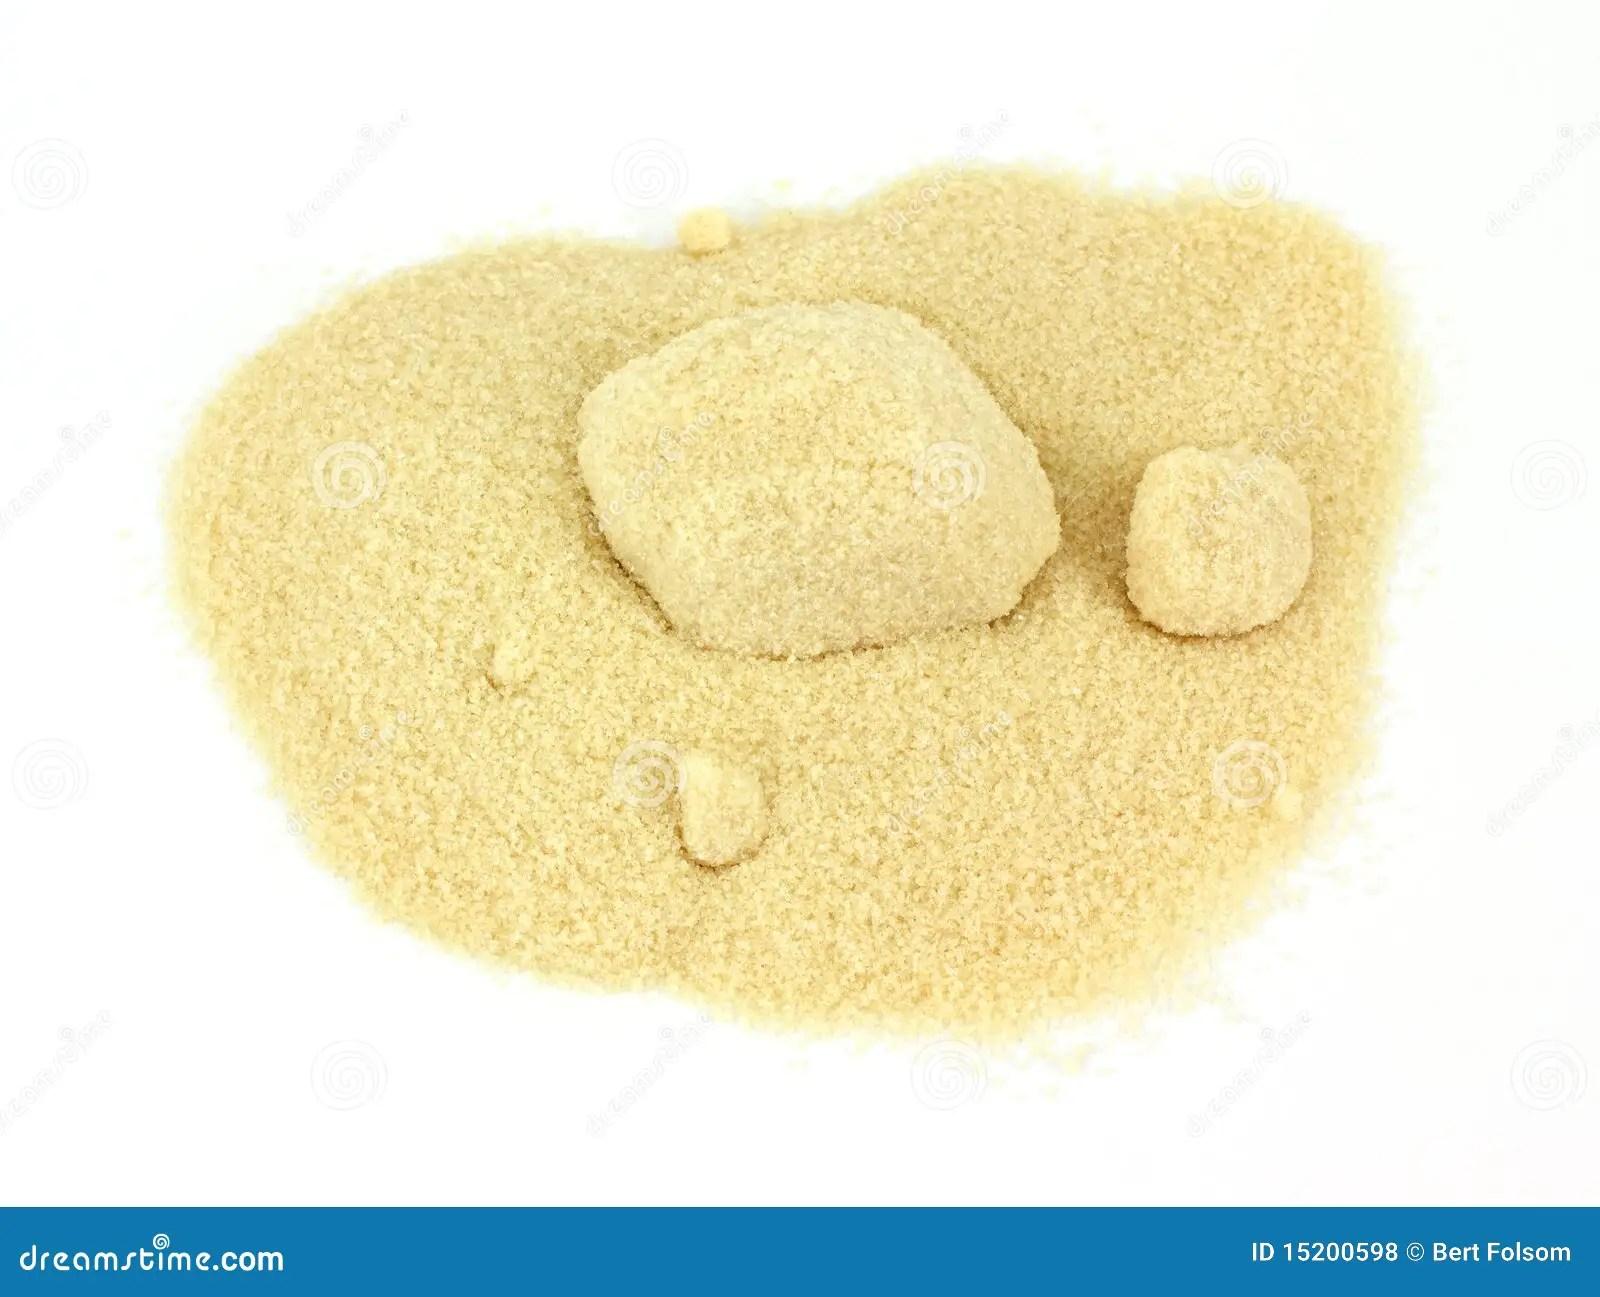 Milled Cane Sugar Royalty Free Stock Photos - Image: 15200598